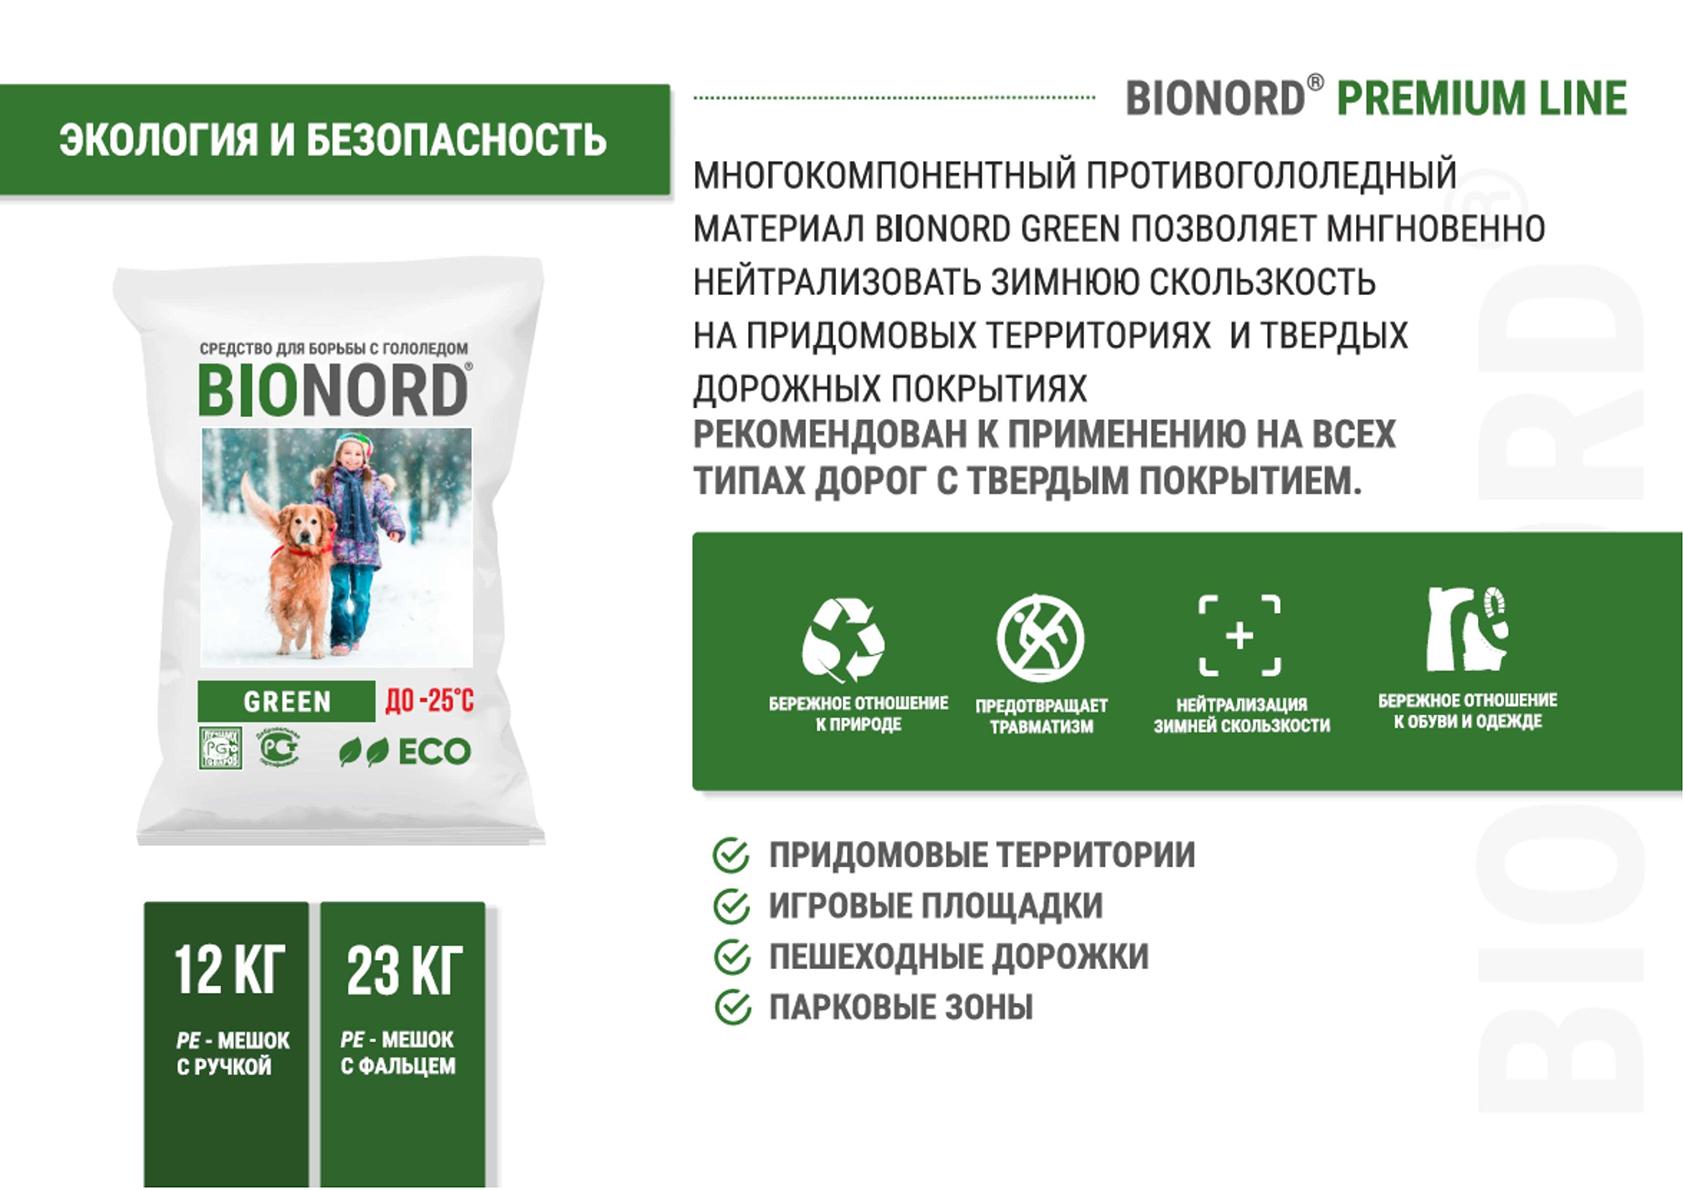 BIONORD GREEN - BIONORD® Premium Line